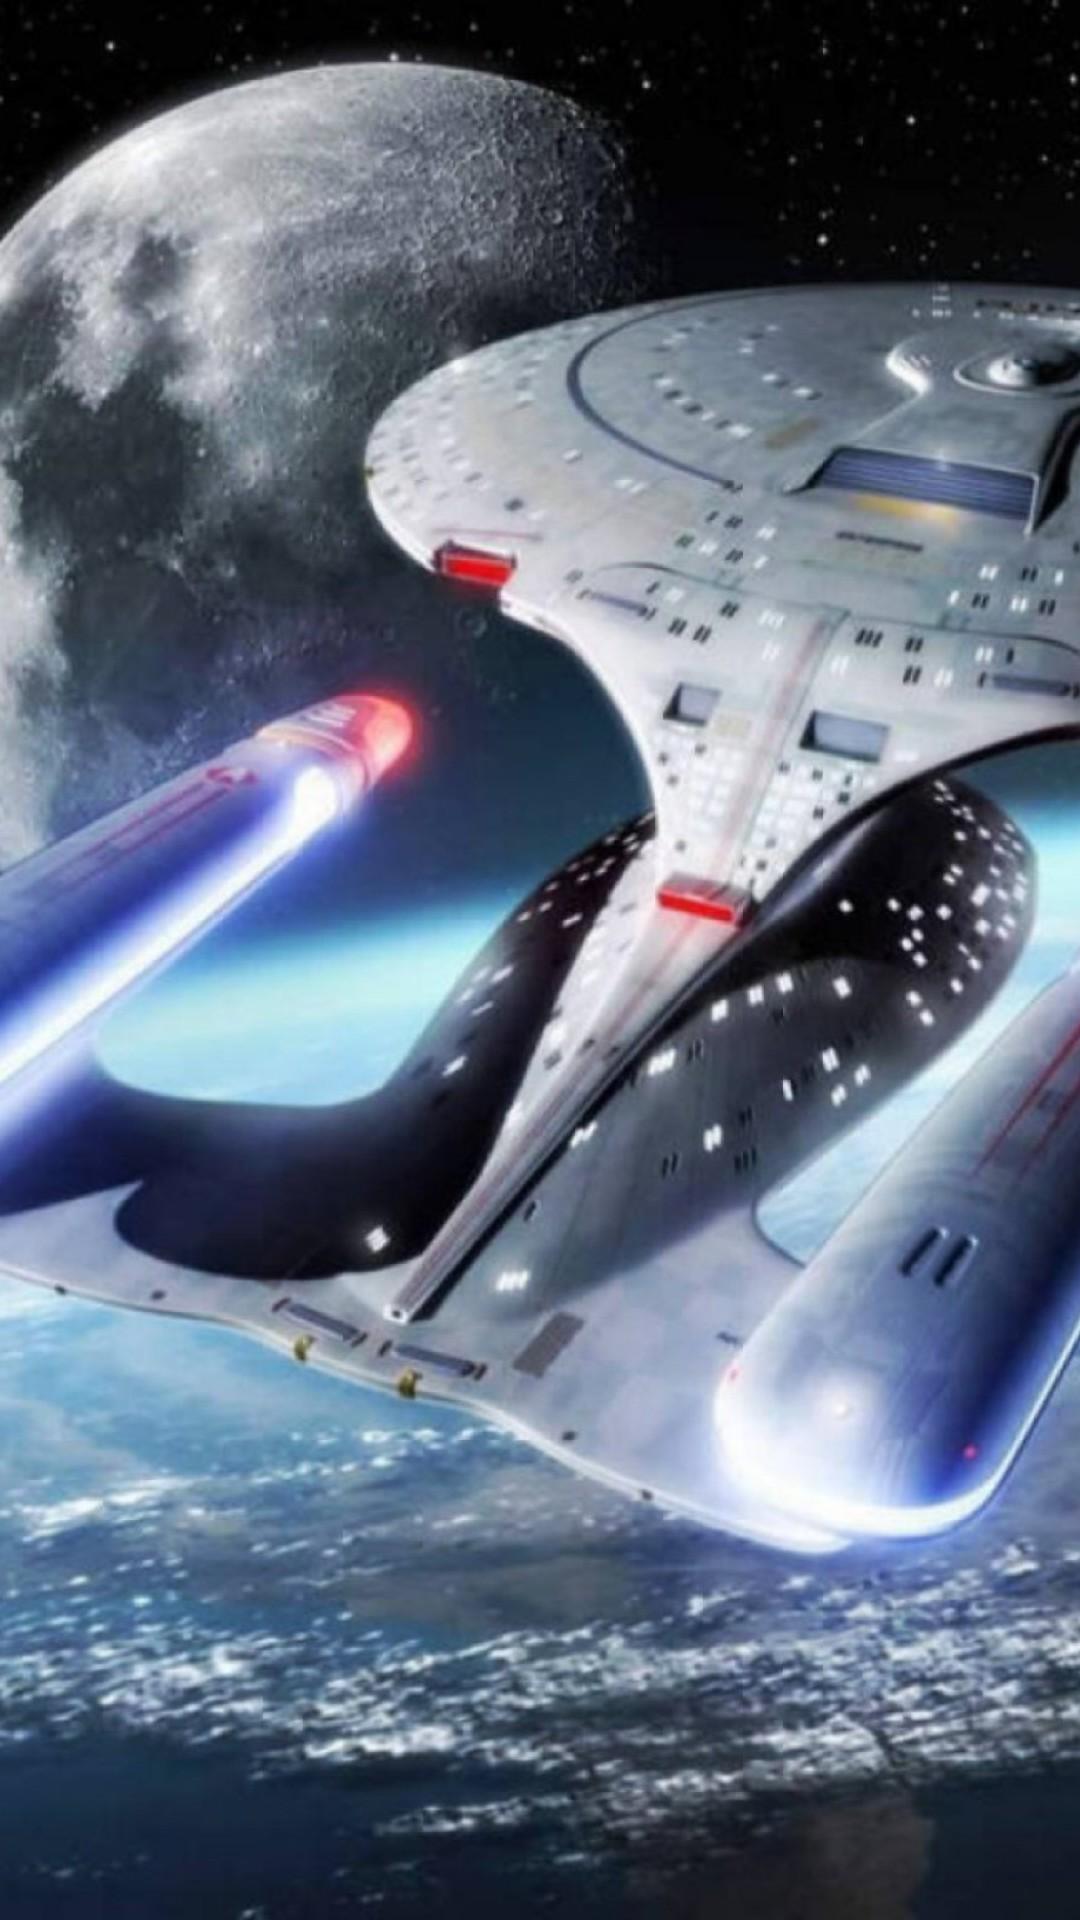 Star Trek Pics. Star Trek Wallpapers